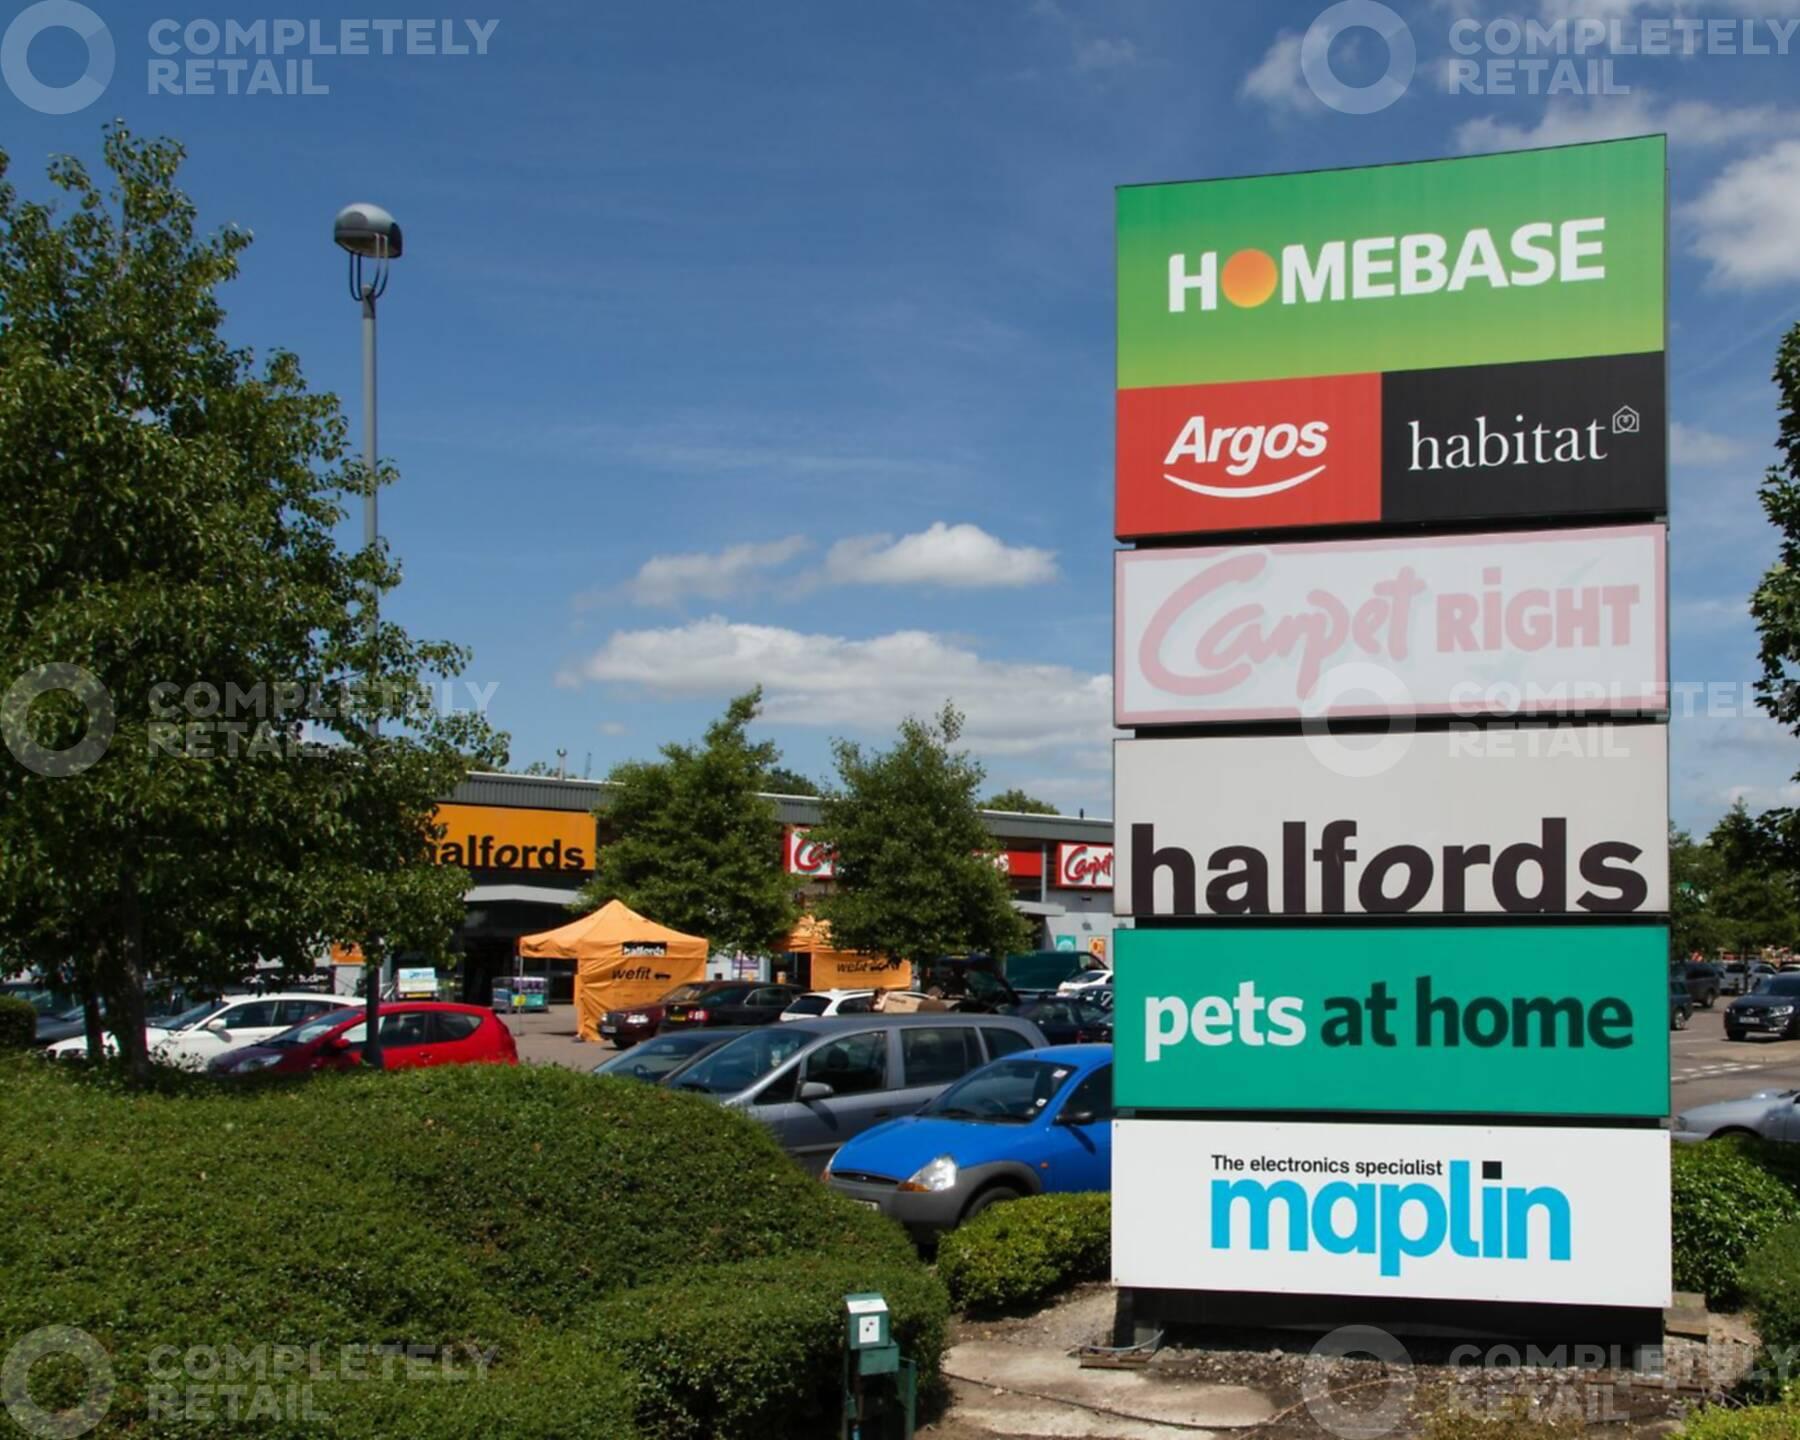 Maidenhead Retail Park Maidenhead Completely Property